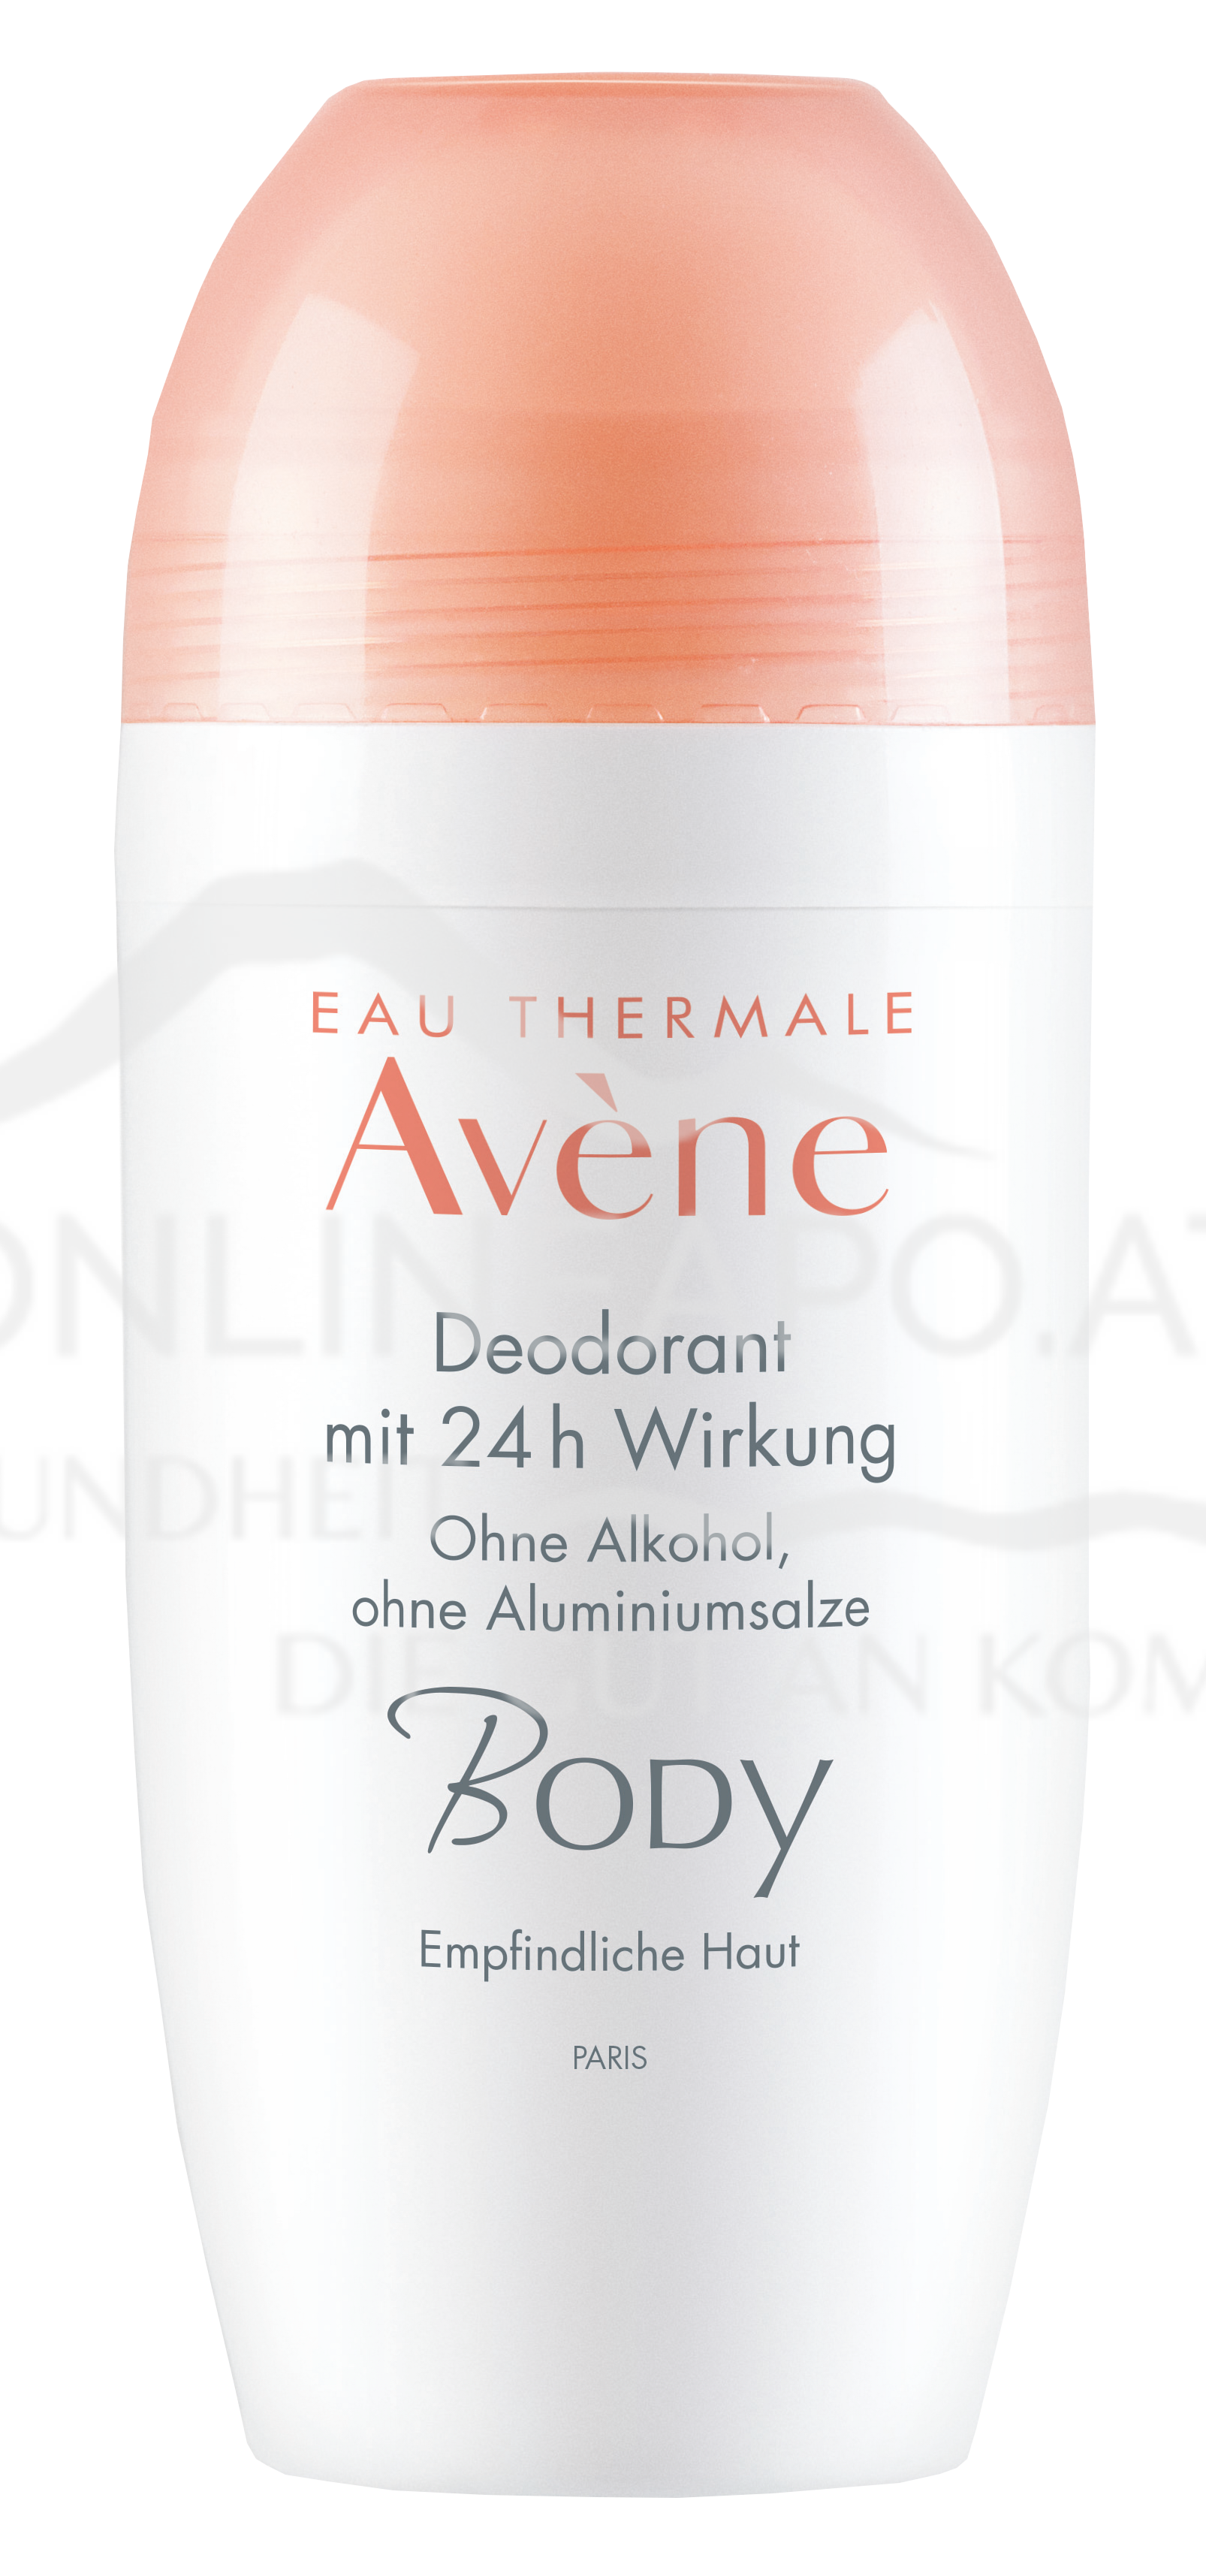 Avène Body Deodorant mit 24h Wirkung